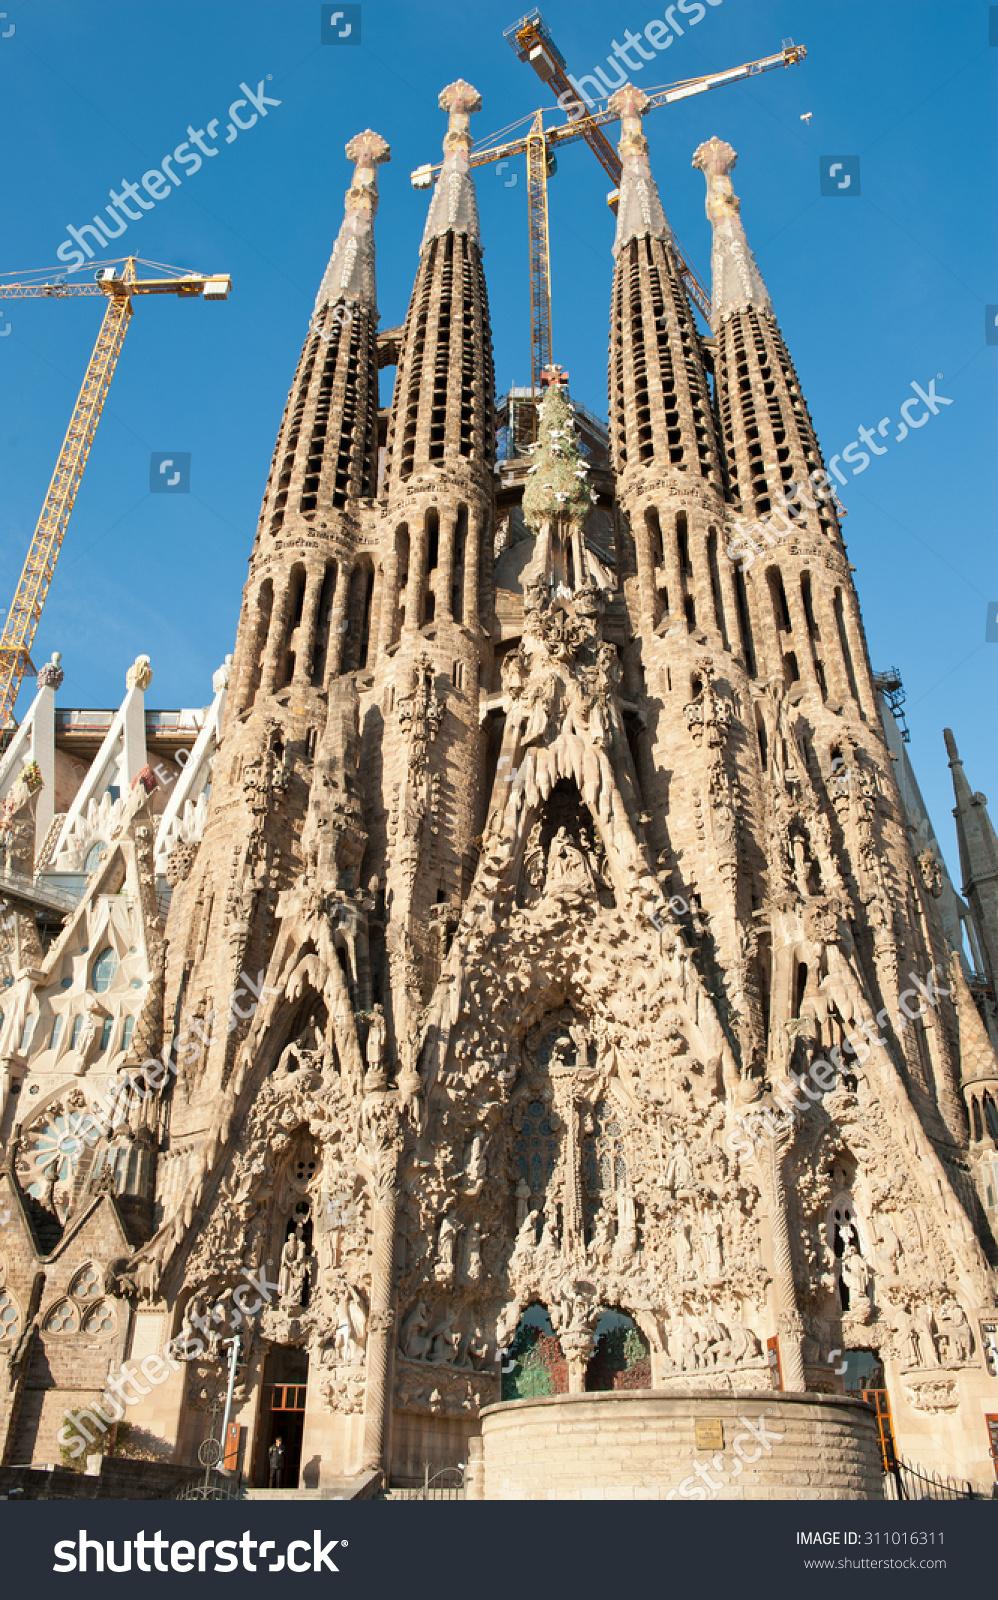 Barcelona Spain April 28 2015 Sagrada Stock Photo Edit Now 311016311